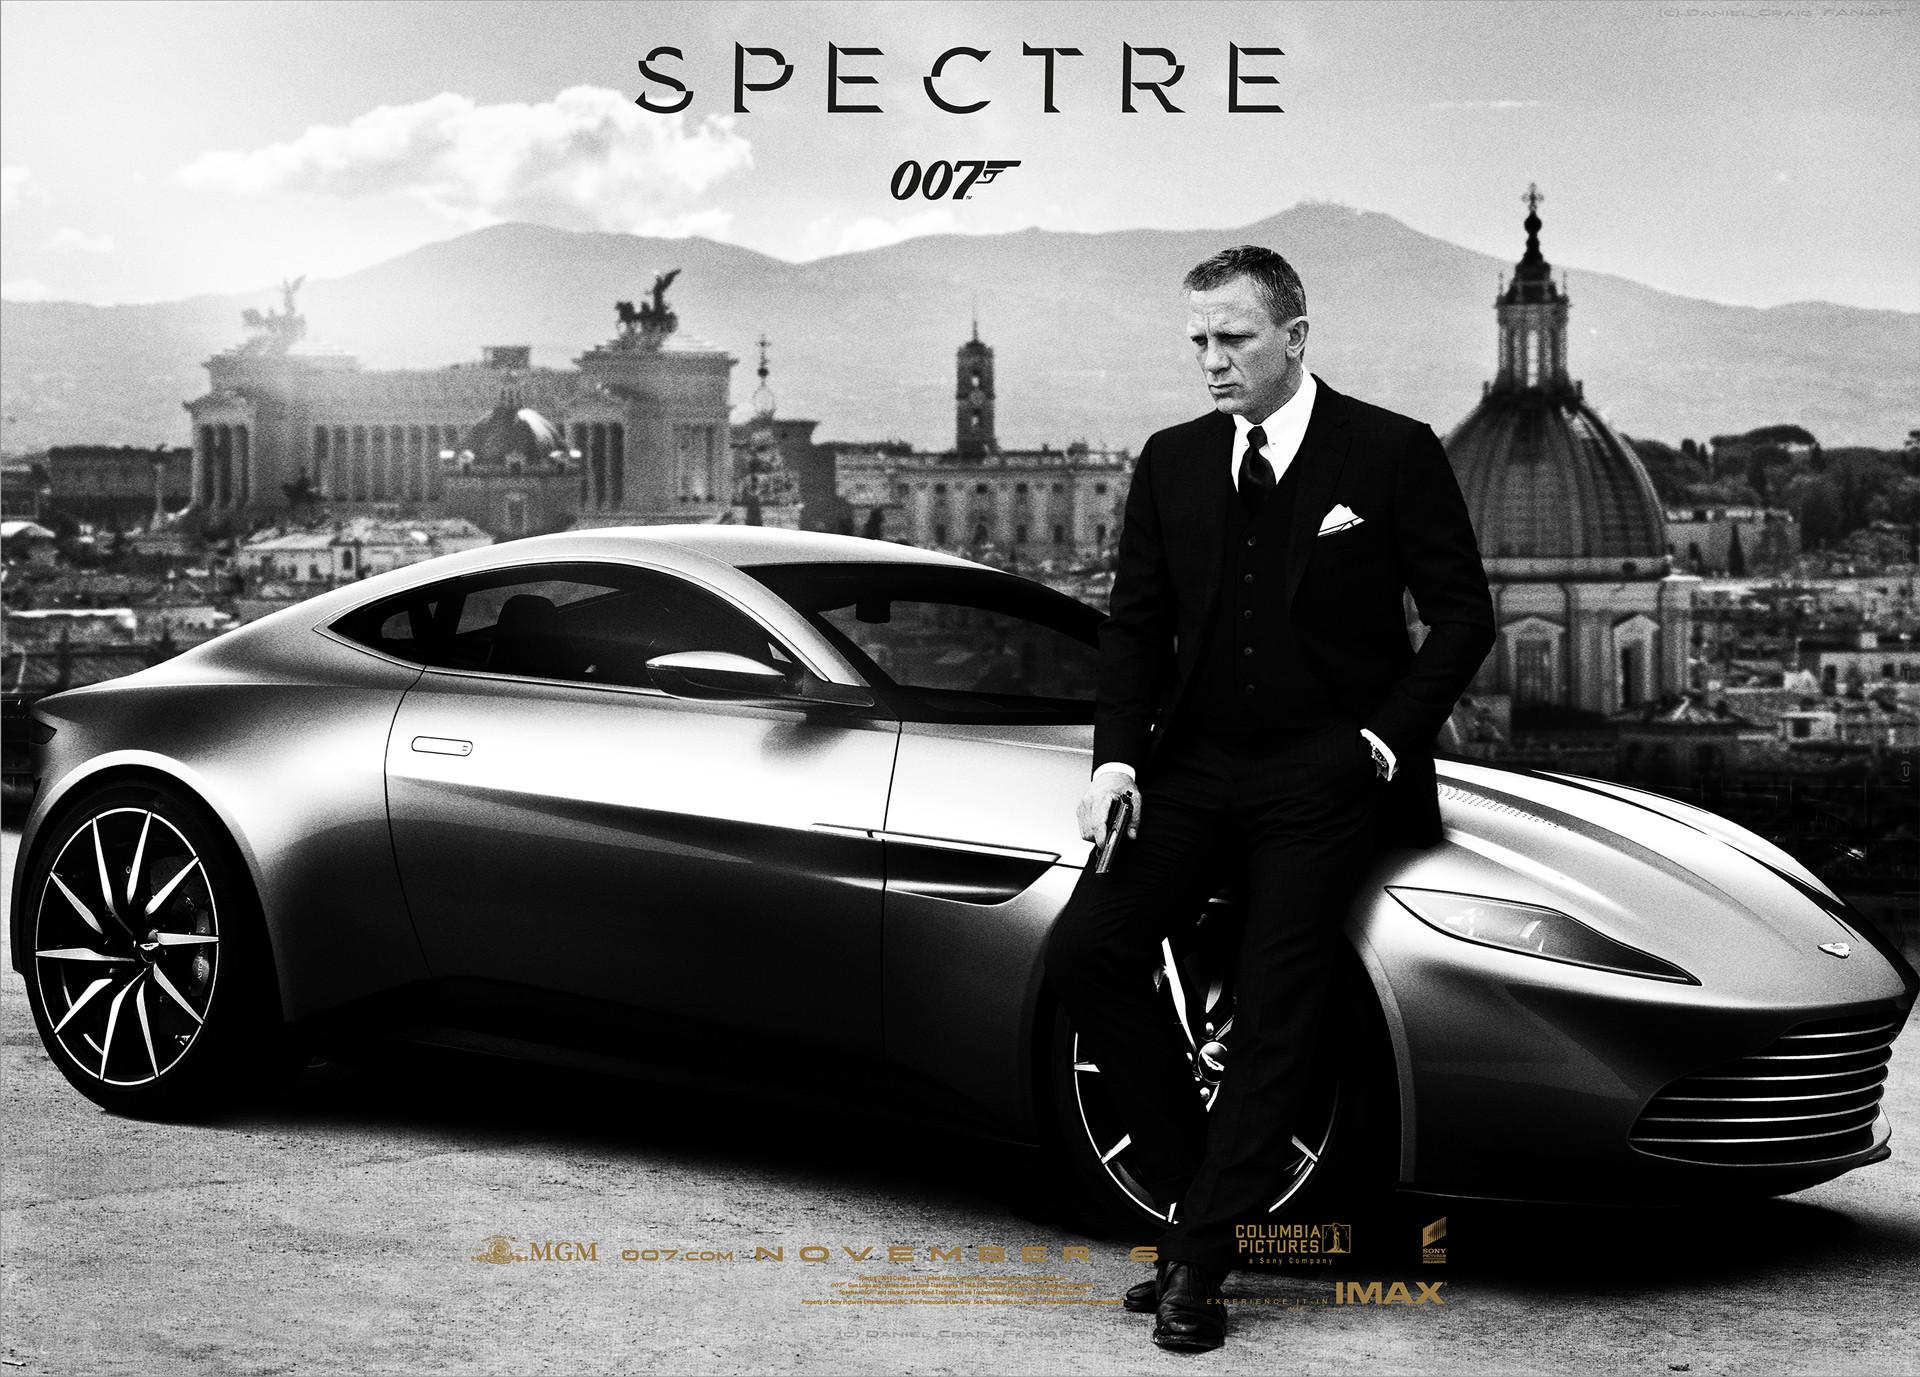 Daniel Craig Lea Seydoux Spectre 2015 James Bond 007 Wallpaper HD 1920x1377